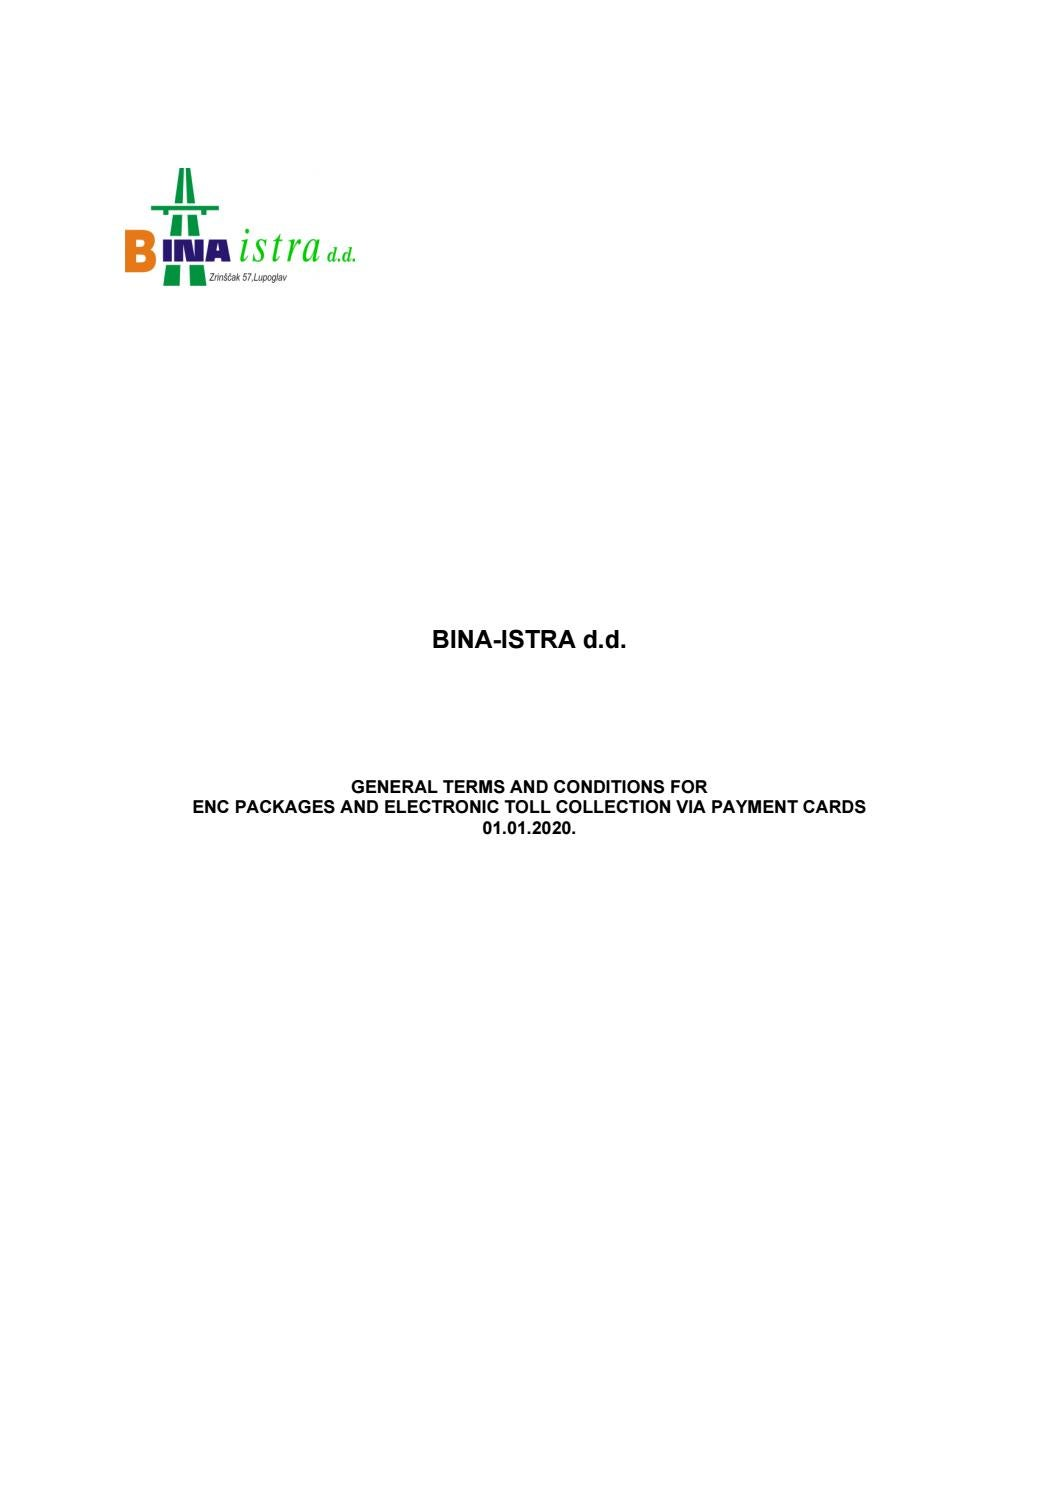 Https Www Hac Hr Files Shares Nabava Doc Hac H17917odlukaoodabiru Pdf